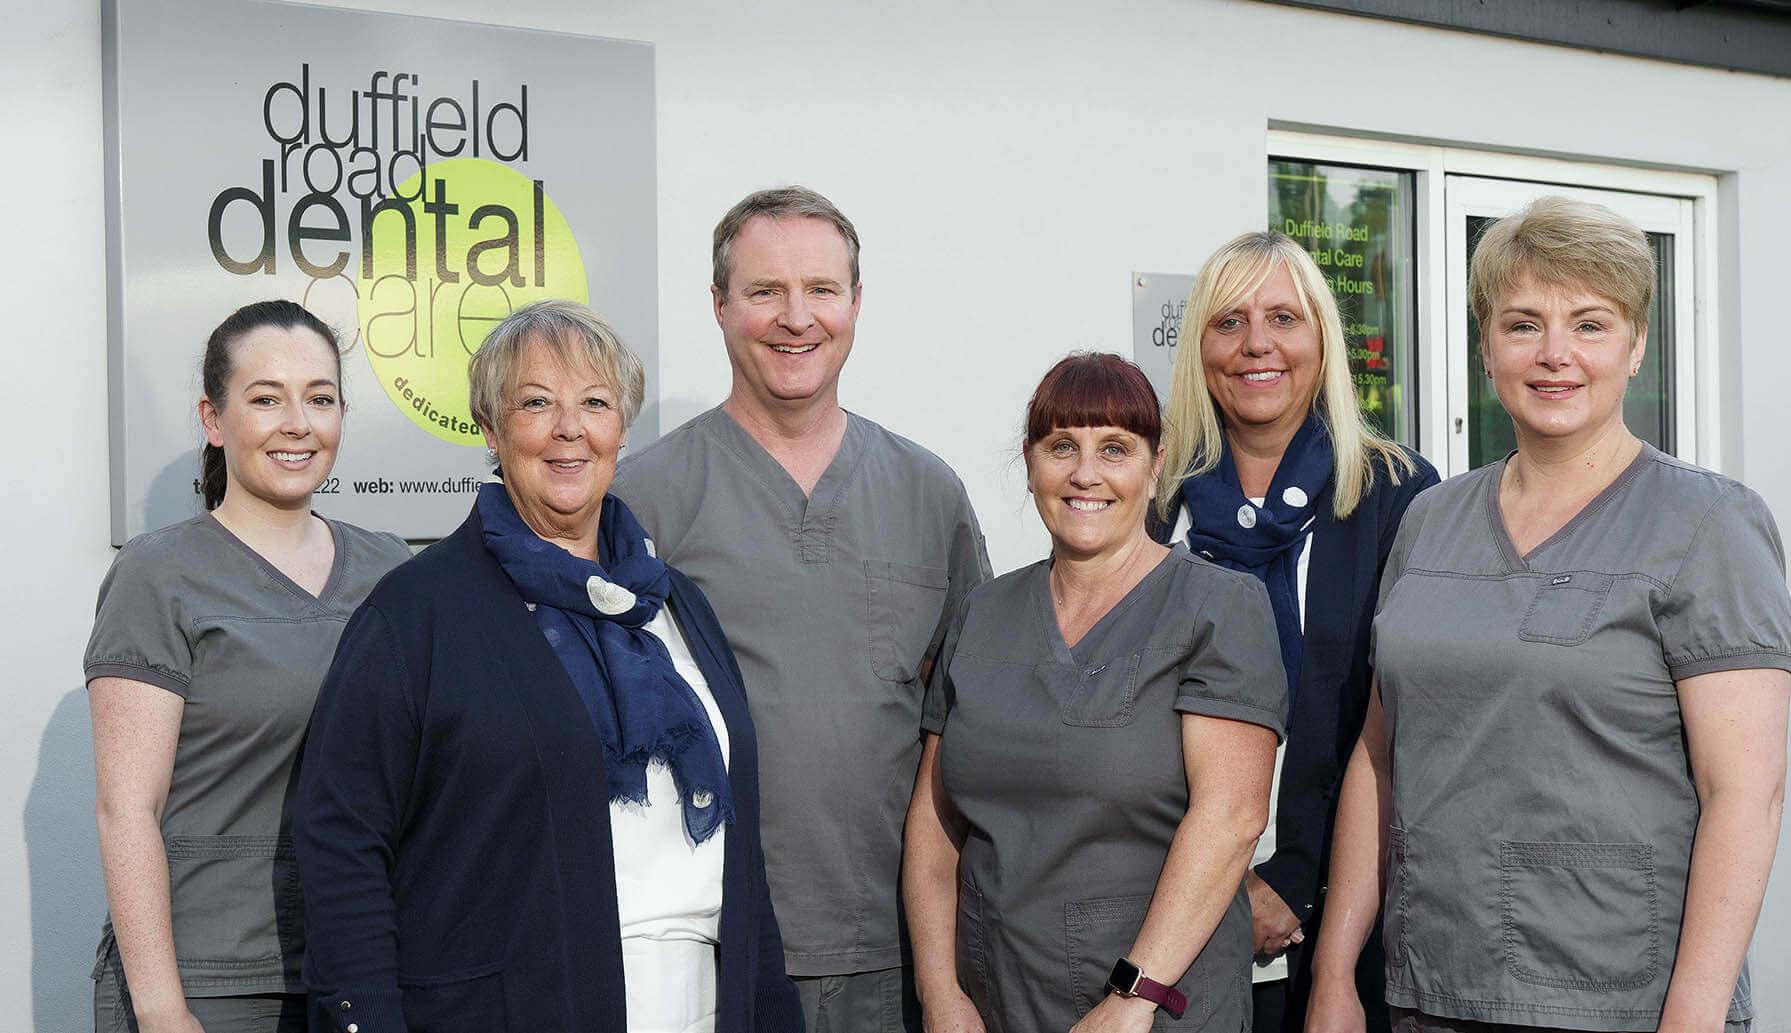 Duffield Road Dental Care